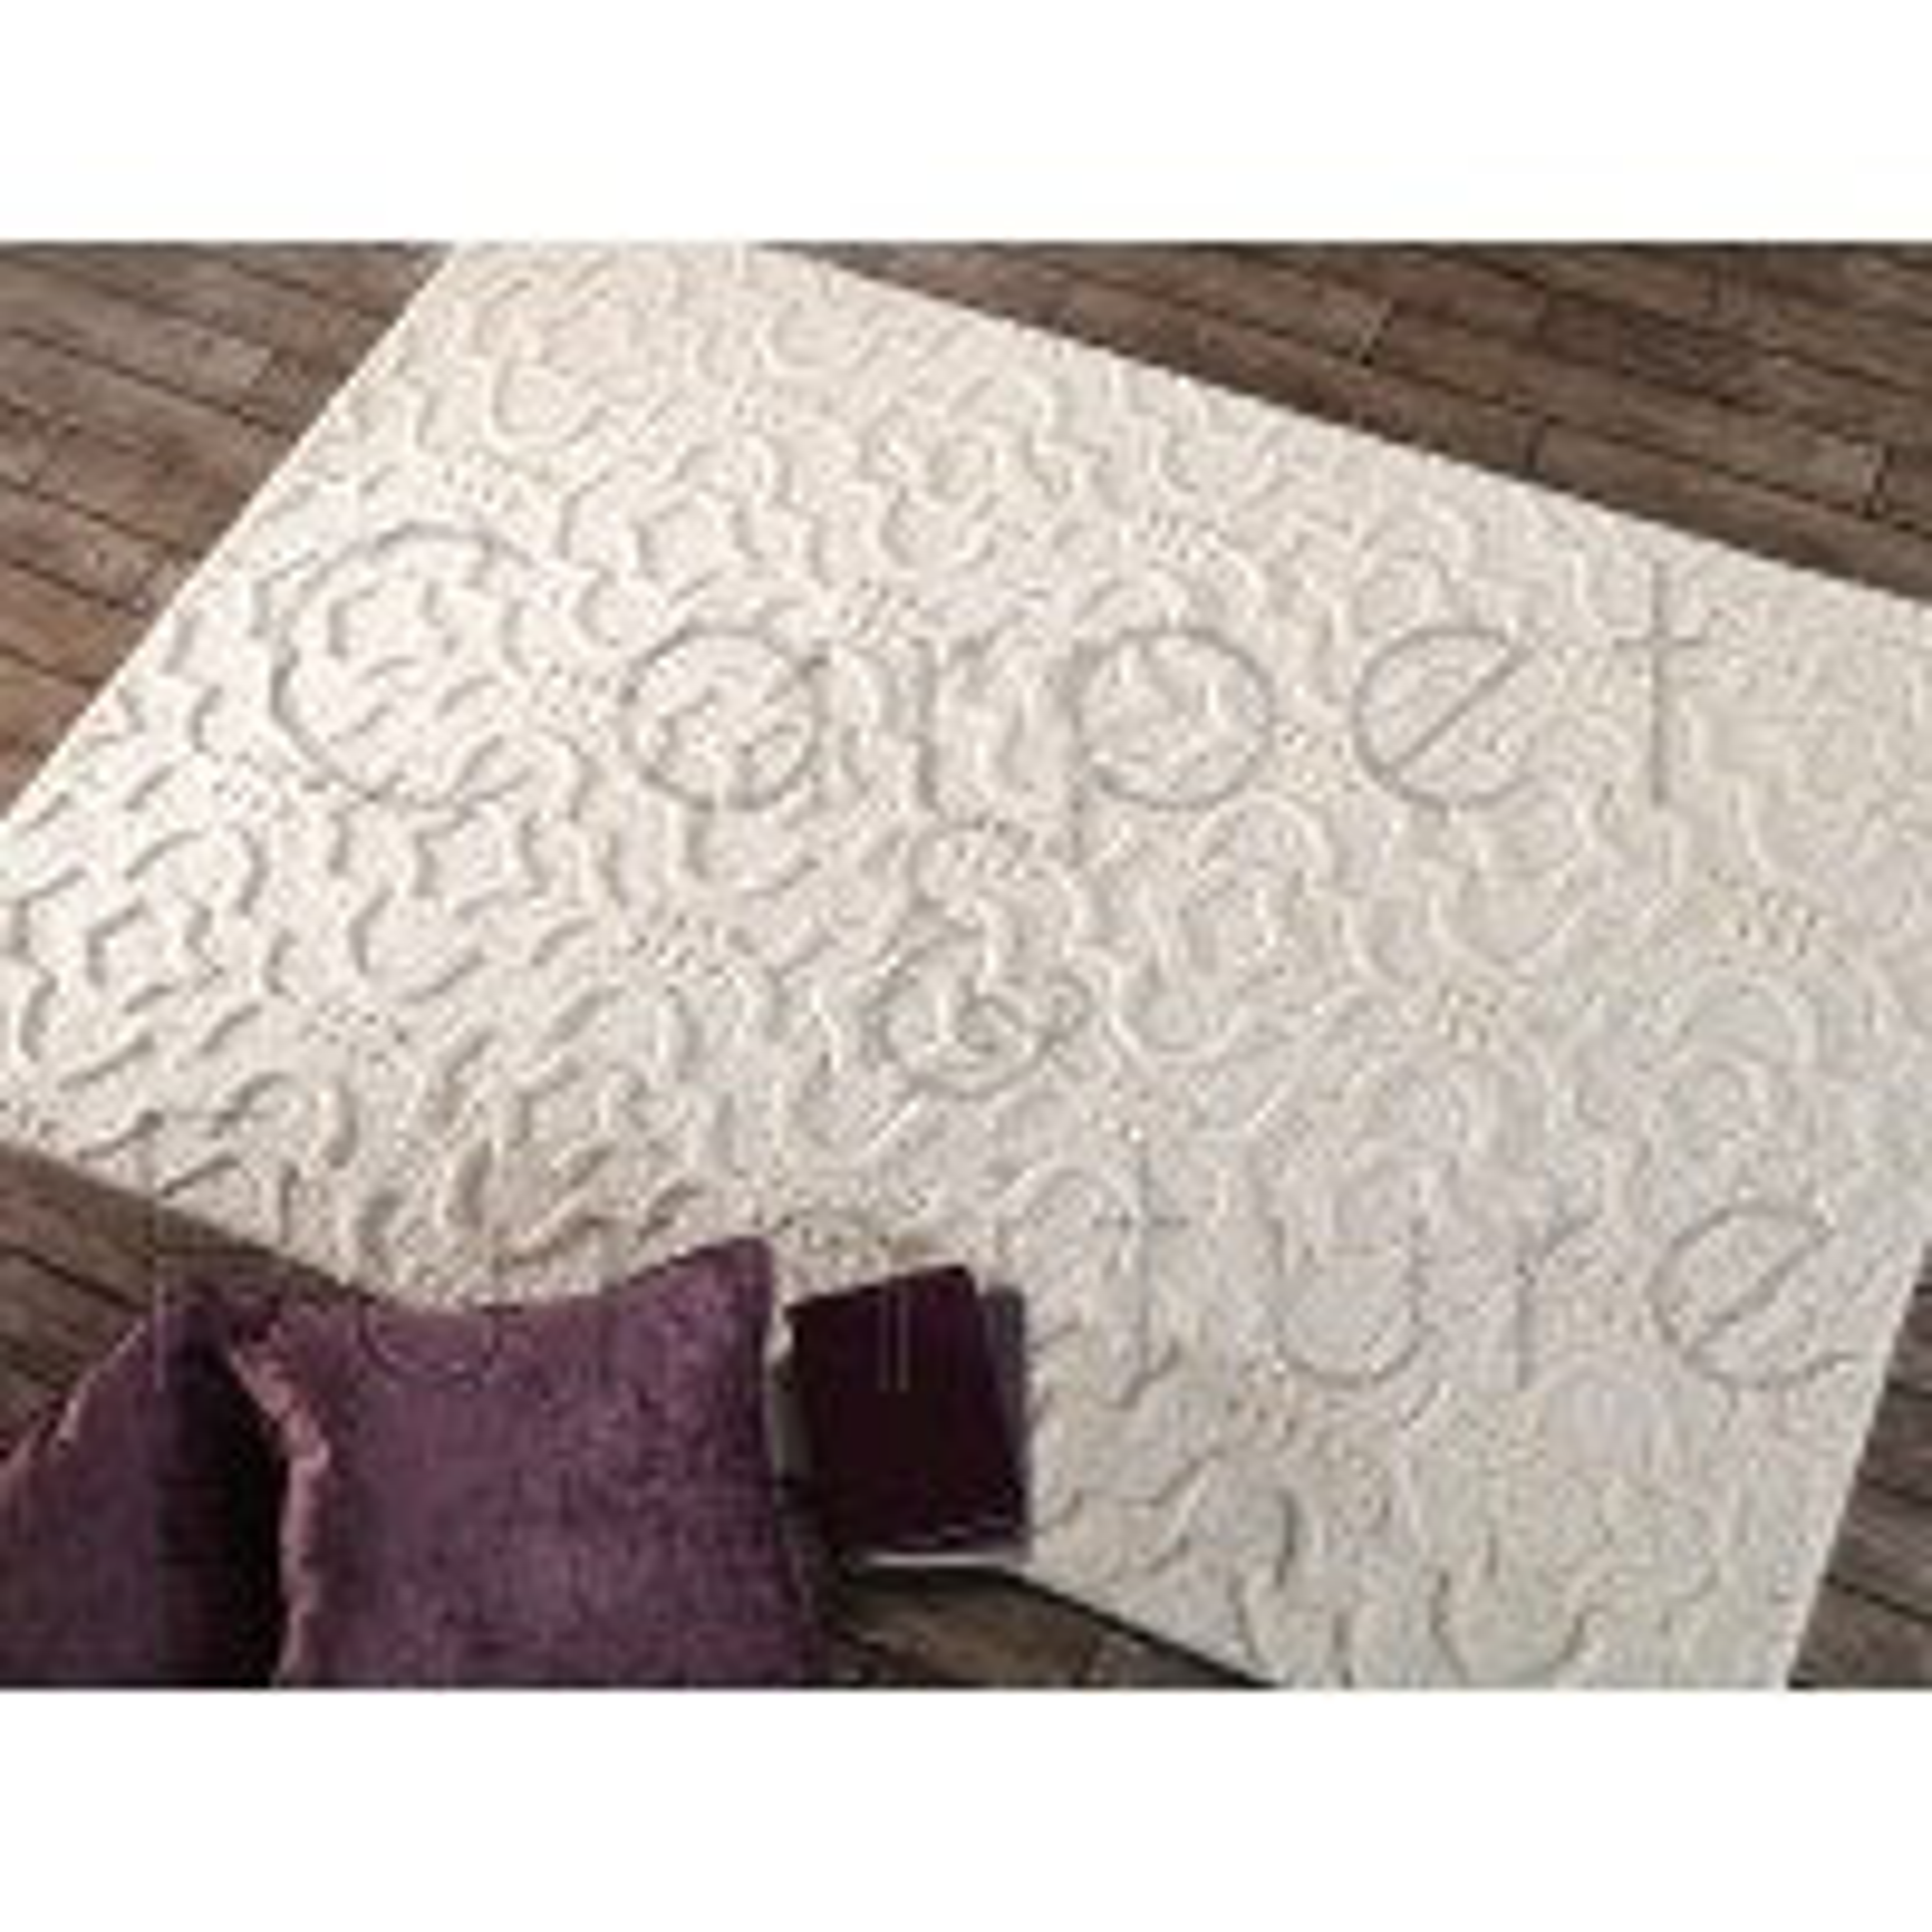 "Moorish Marrakech Cream Rug - Size 200 x 290 cm (6'7"" x 9'6"")"